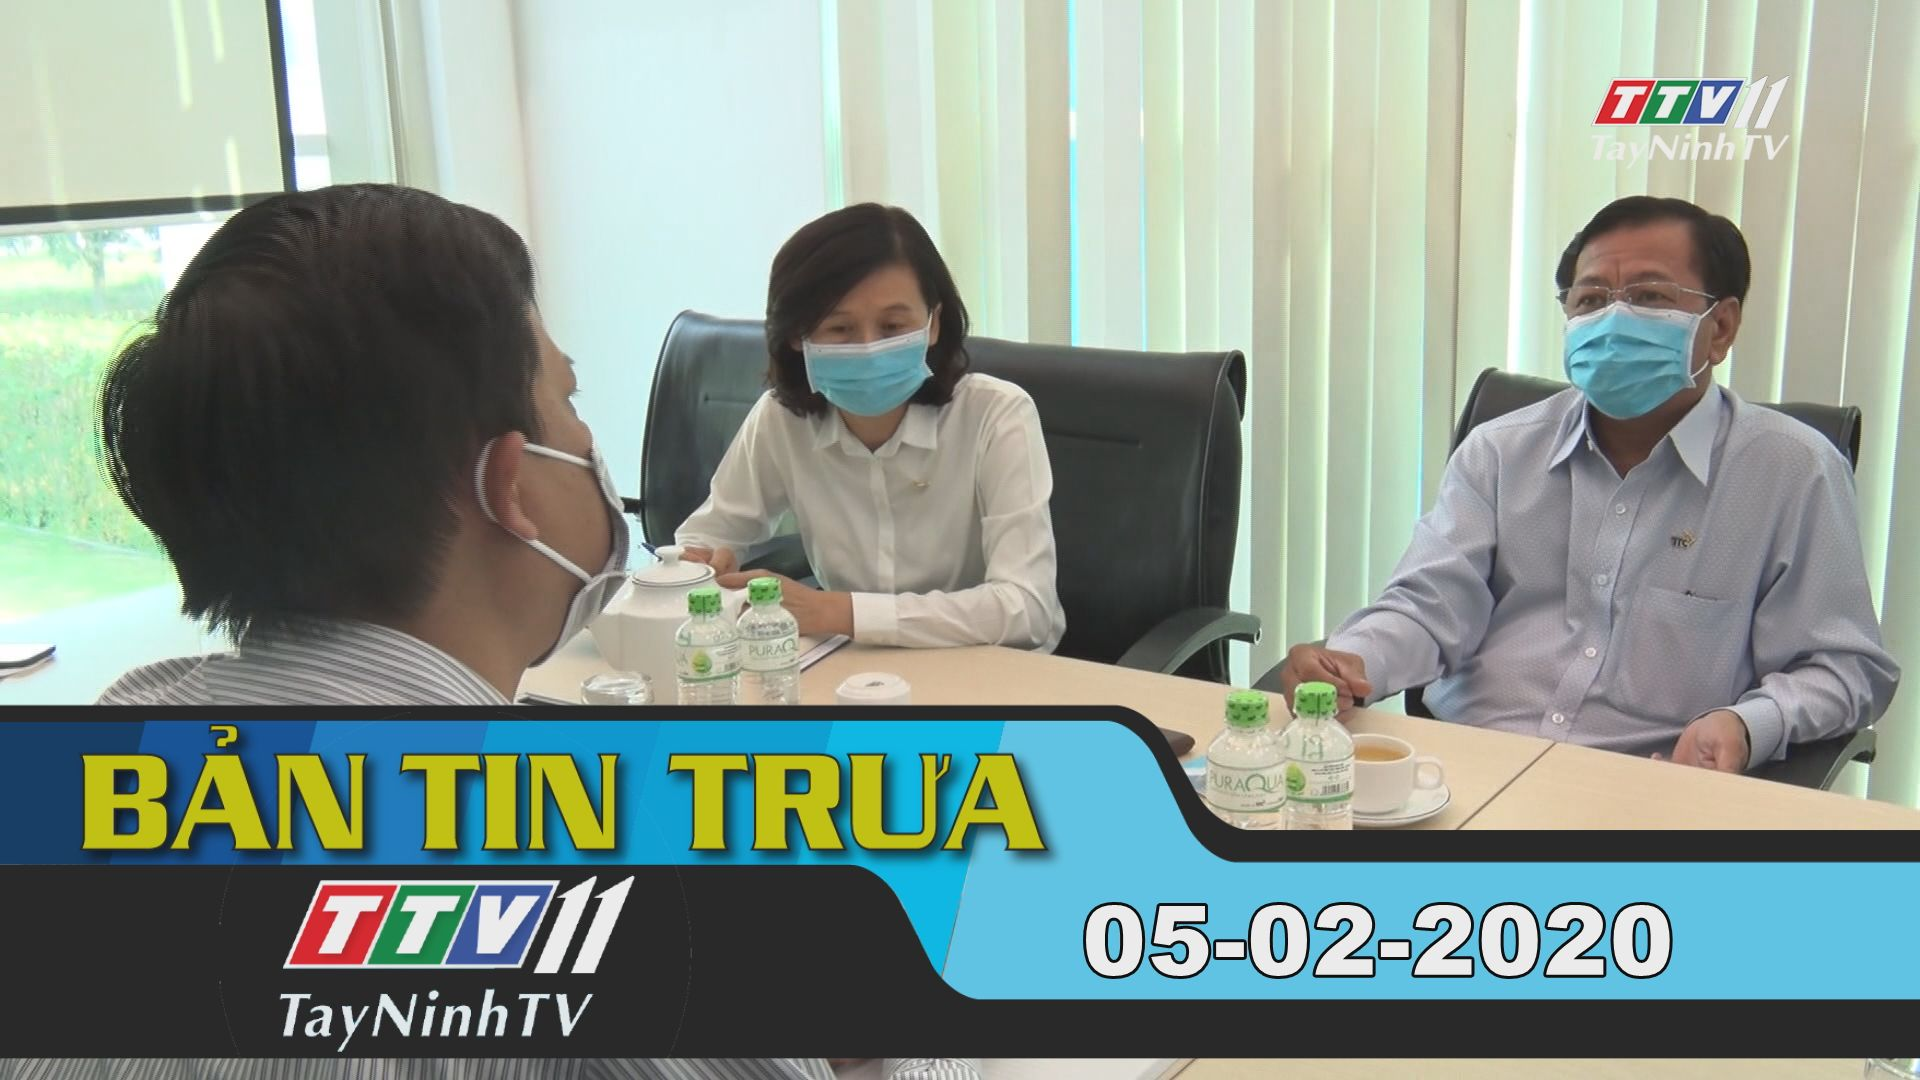 Bản tin trưa 05-02-2020 | Tin tức hôm nay | TayNinhTV